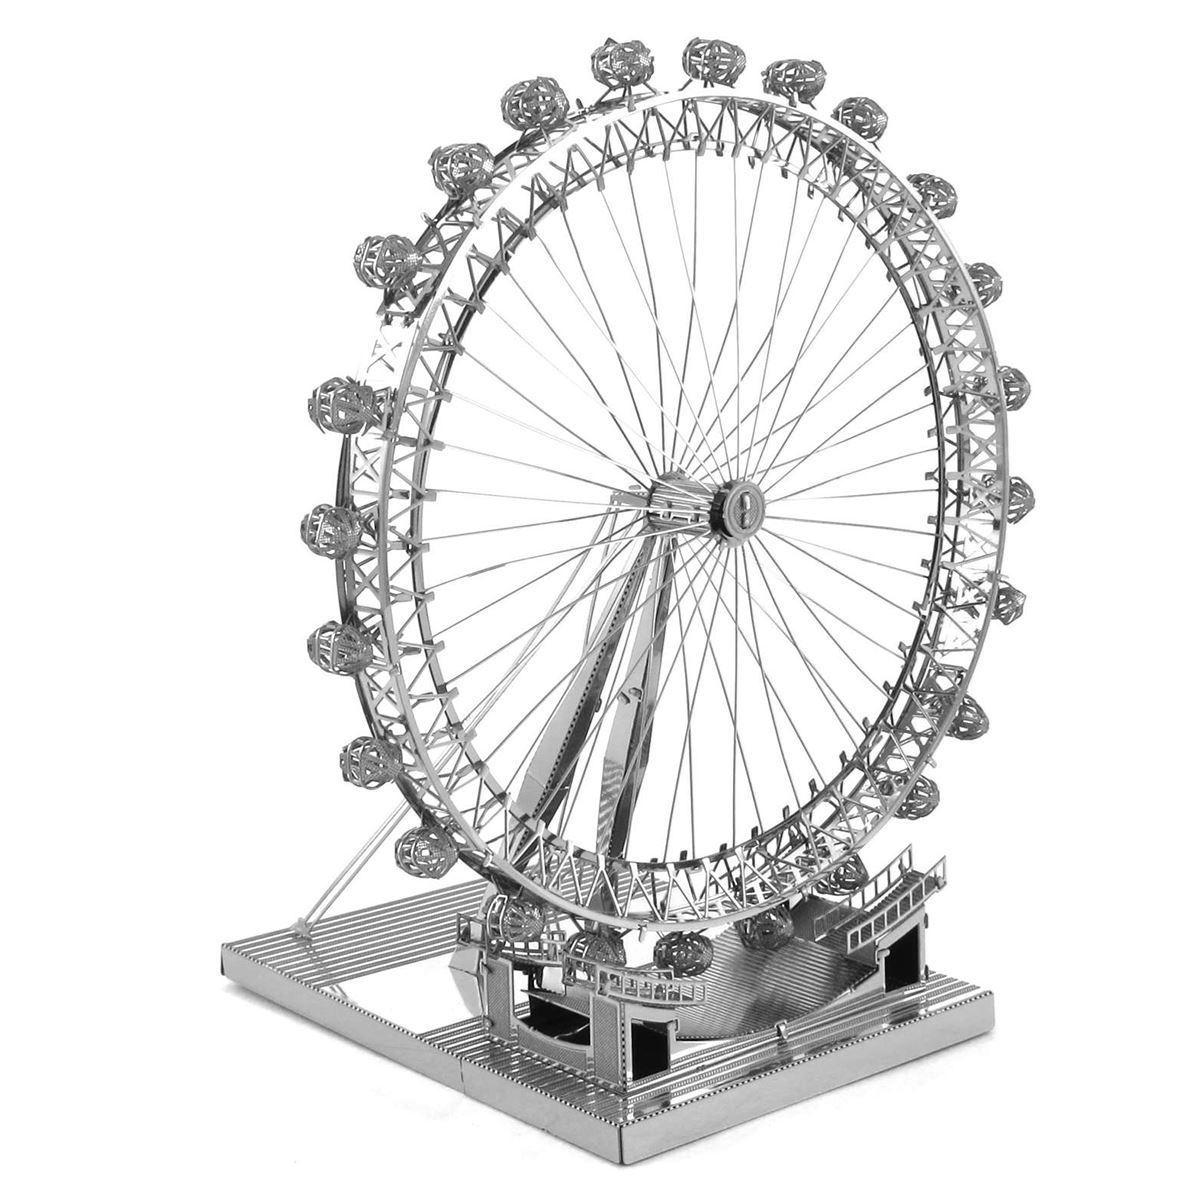 ICX019 Fascinations Metal Earth IconX Metal Model Kit London Eye Ferriswheel